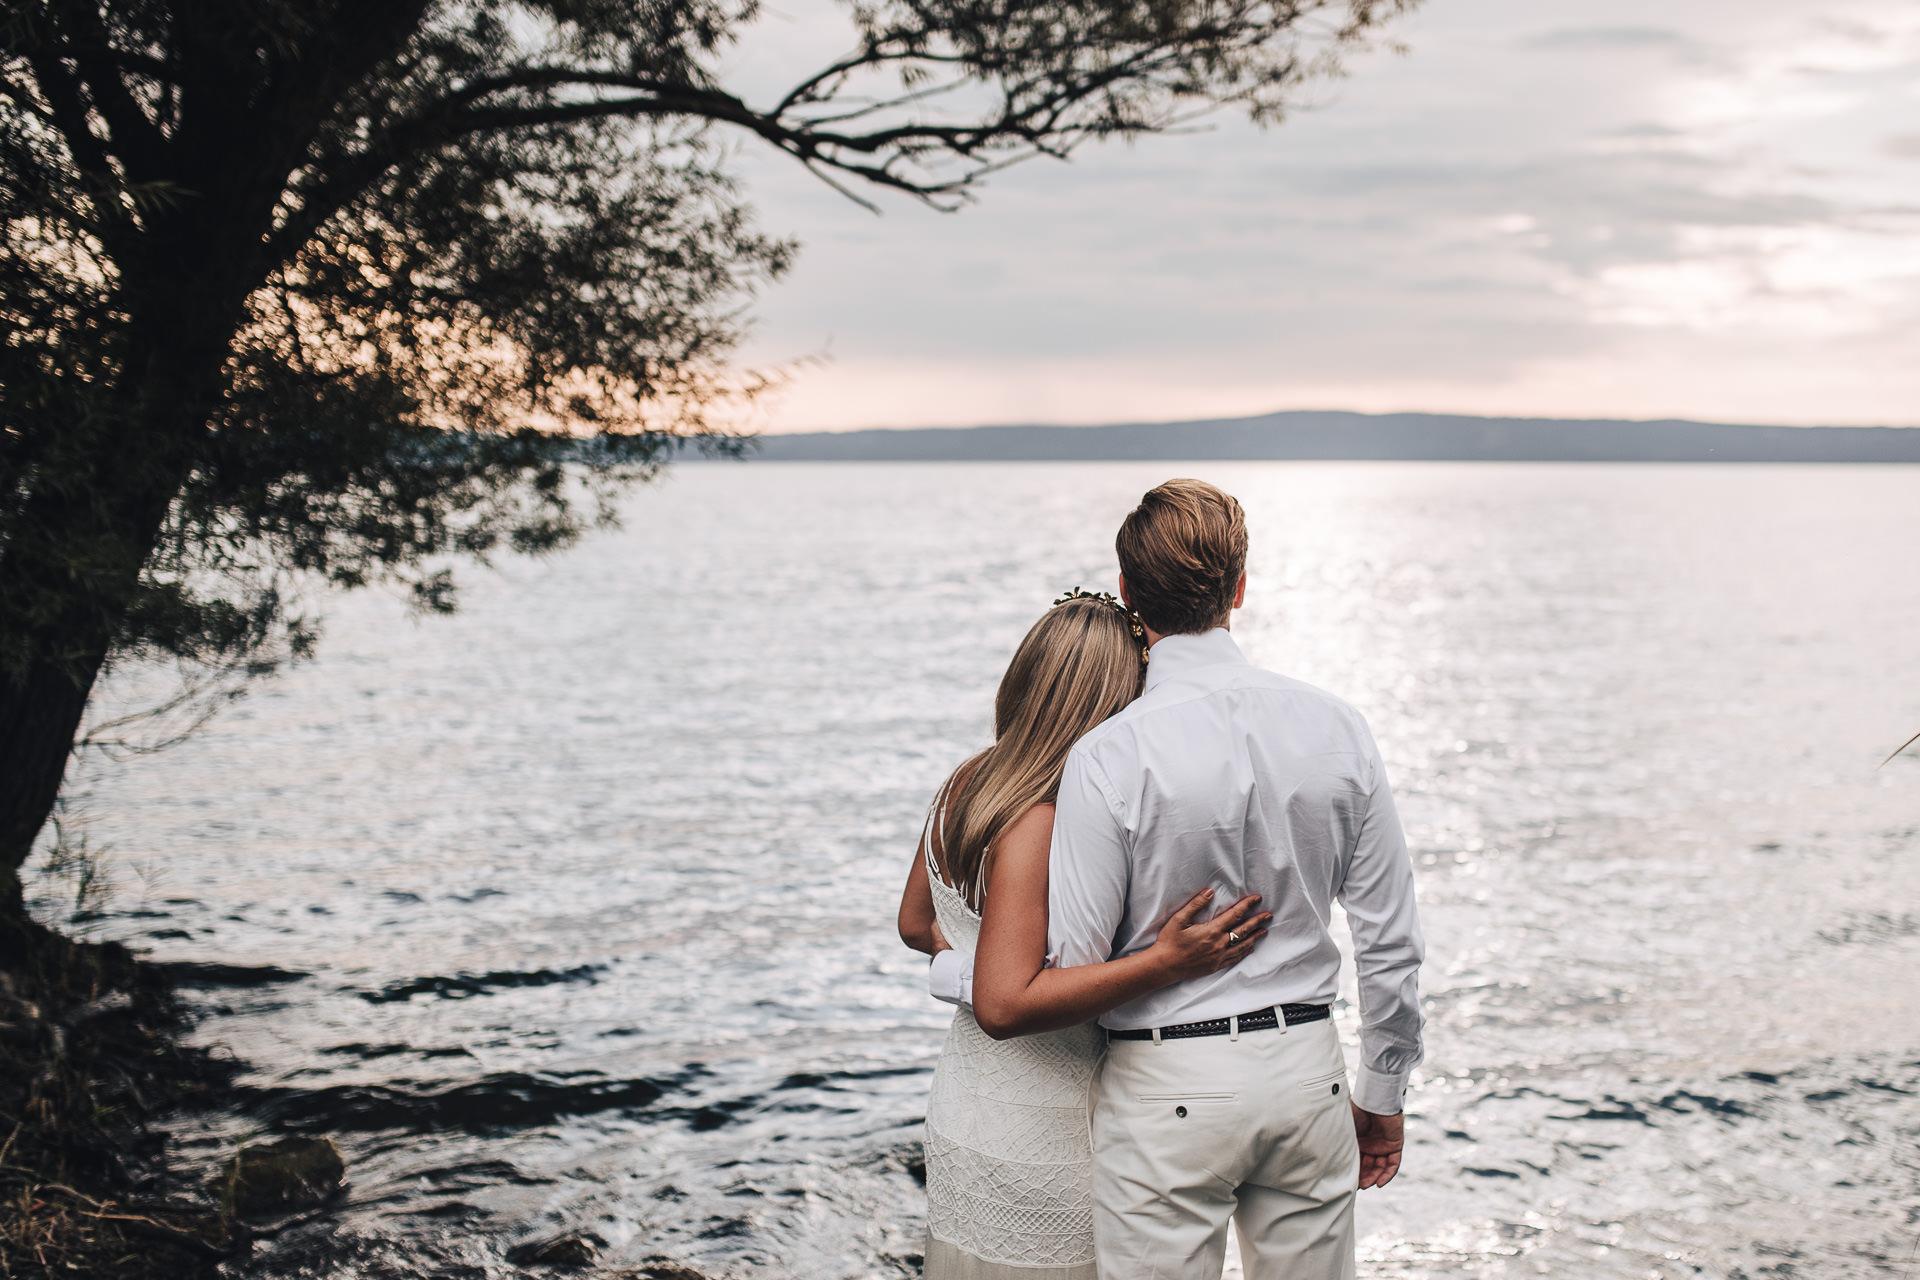 Matrimonio Lago Toscana : Matrimonio boho al lago u whitelife studio